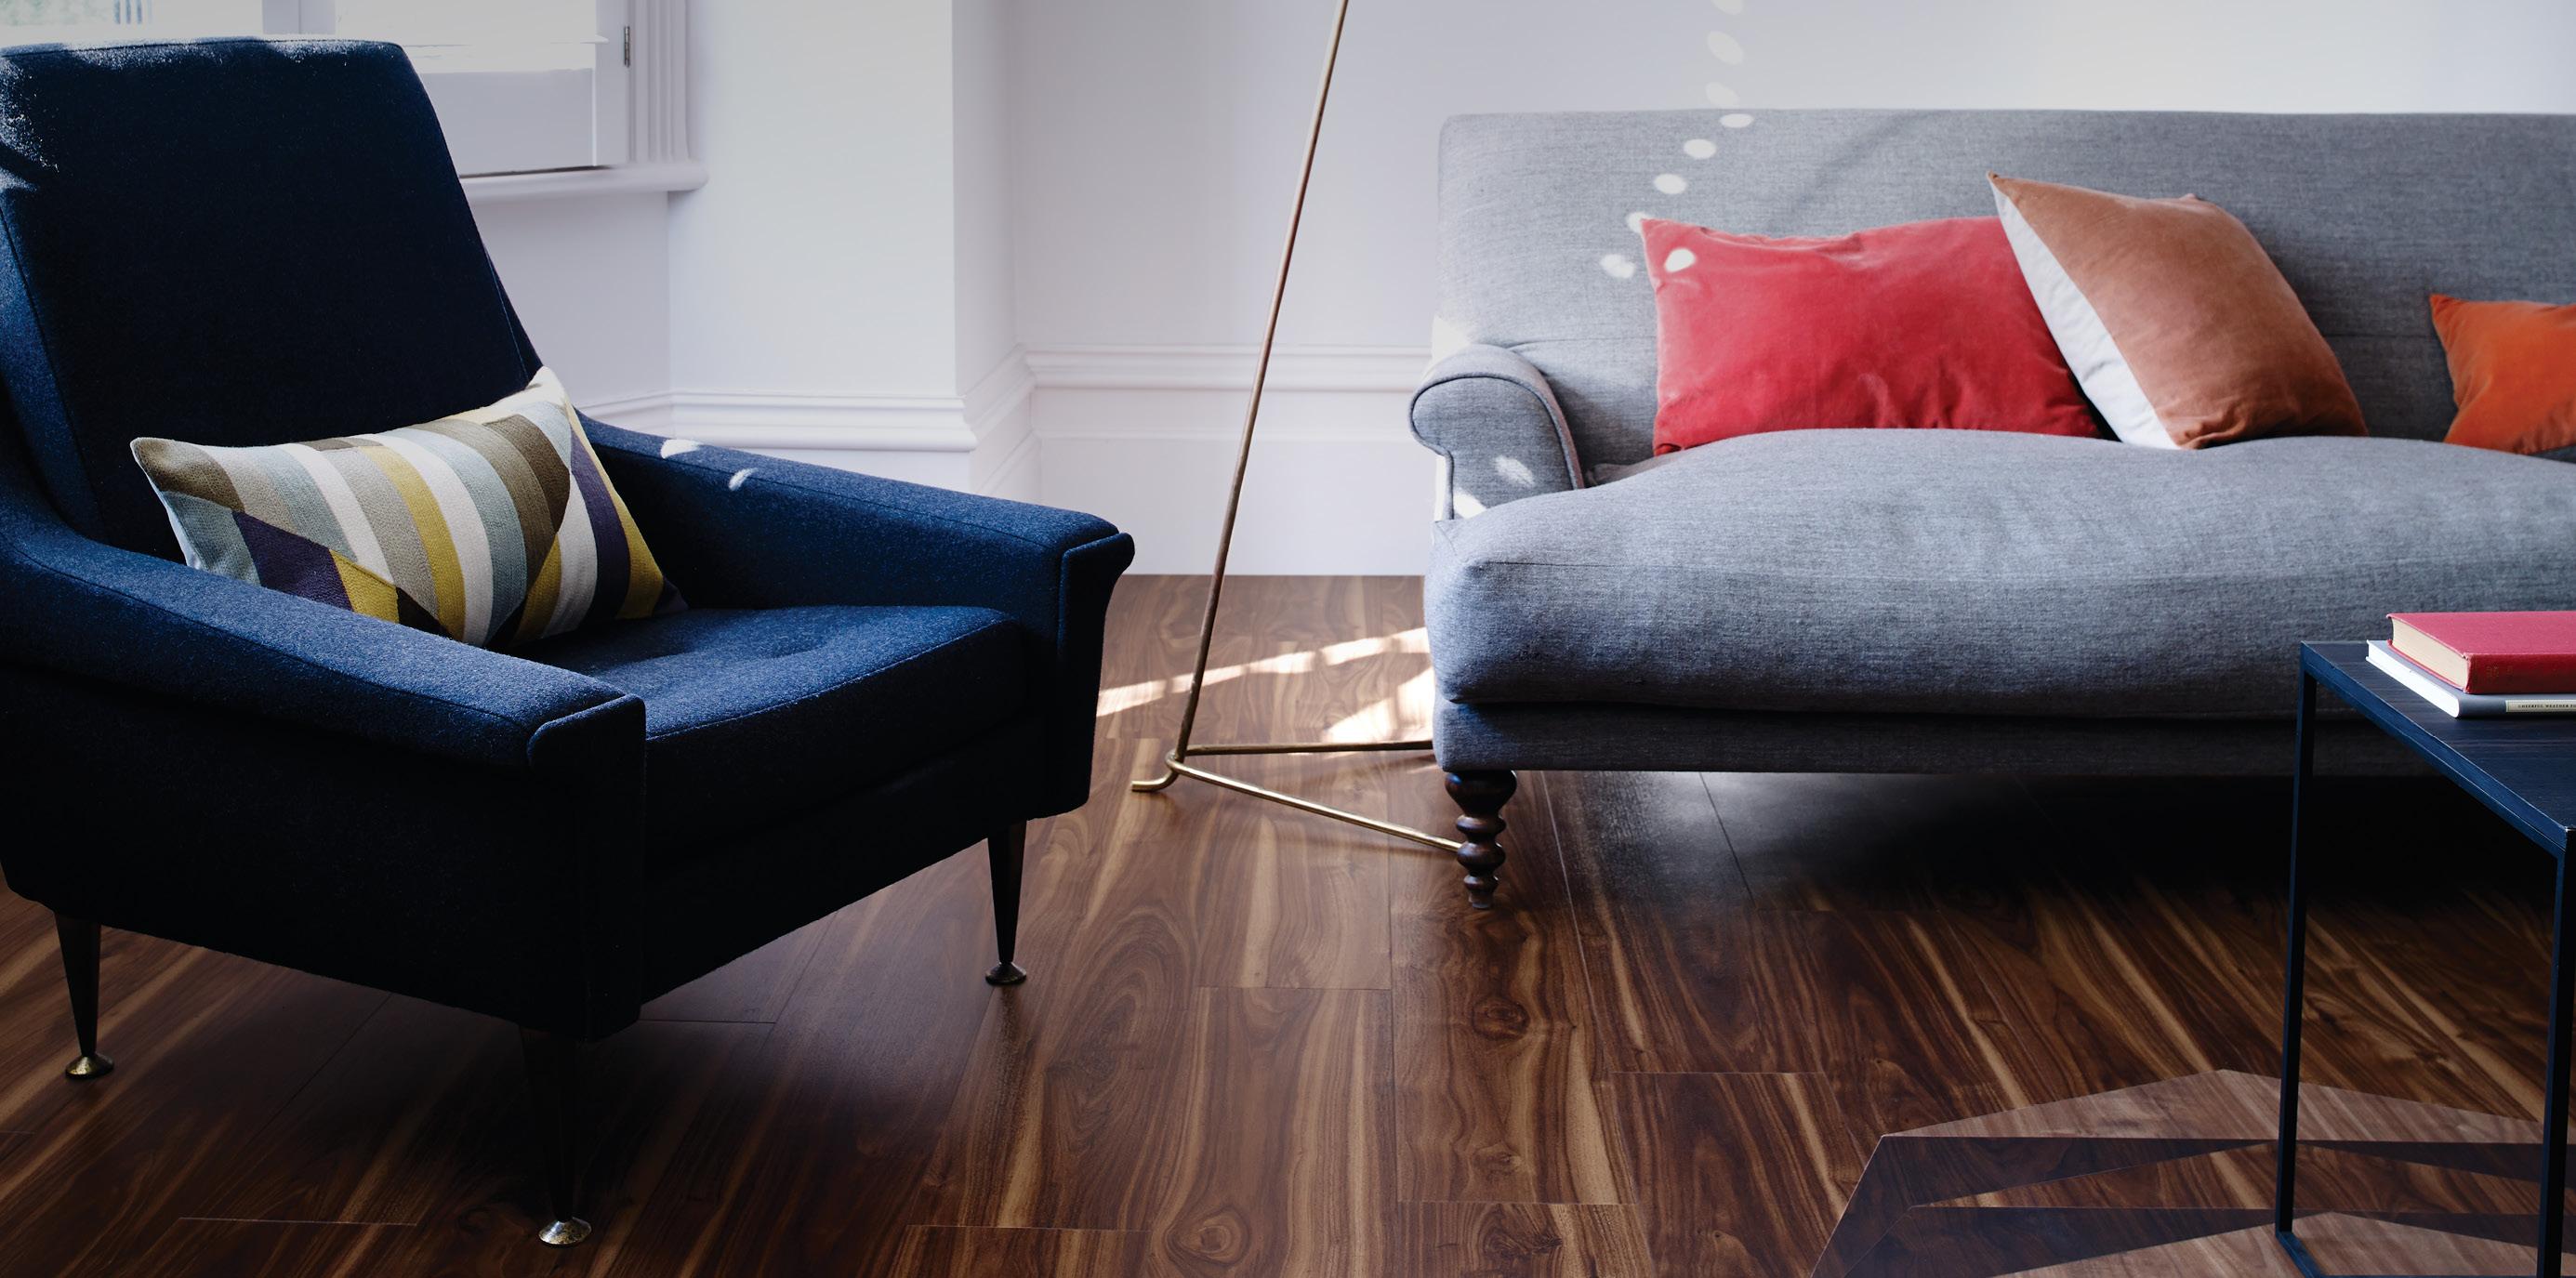 Amtico Signature Wild Walnut (AR0W7620) Wood Flooring In A Stripwood Pattern